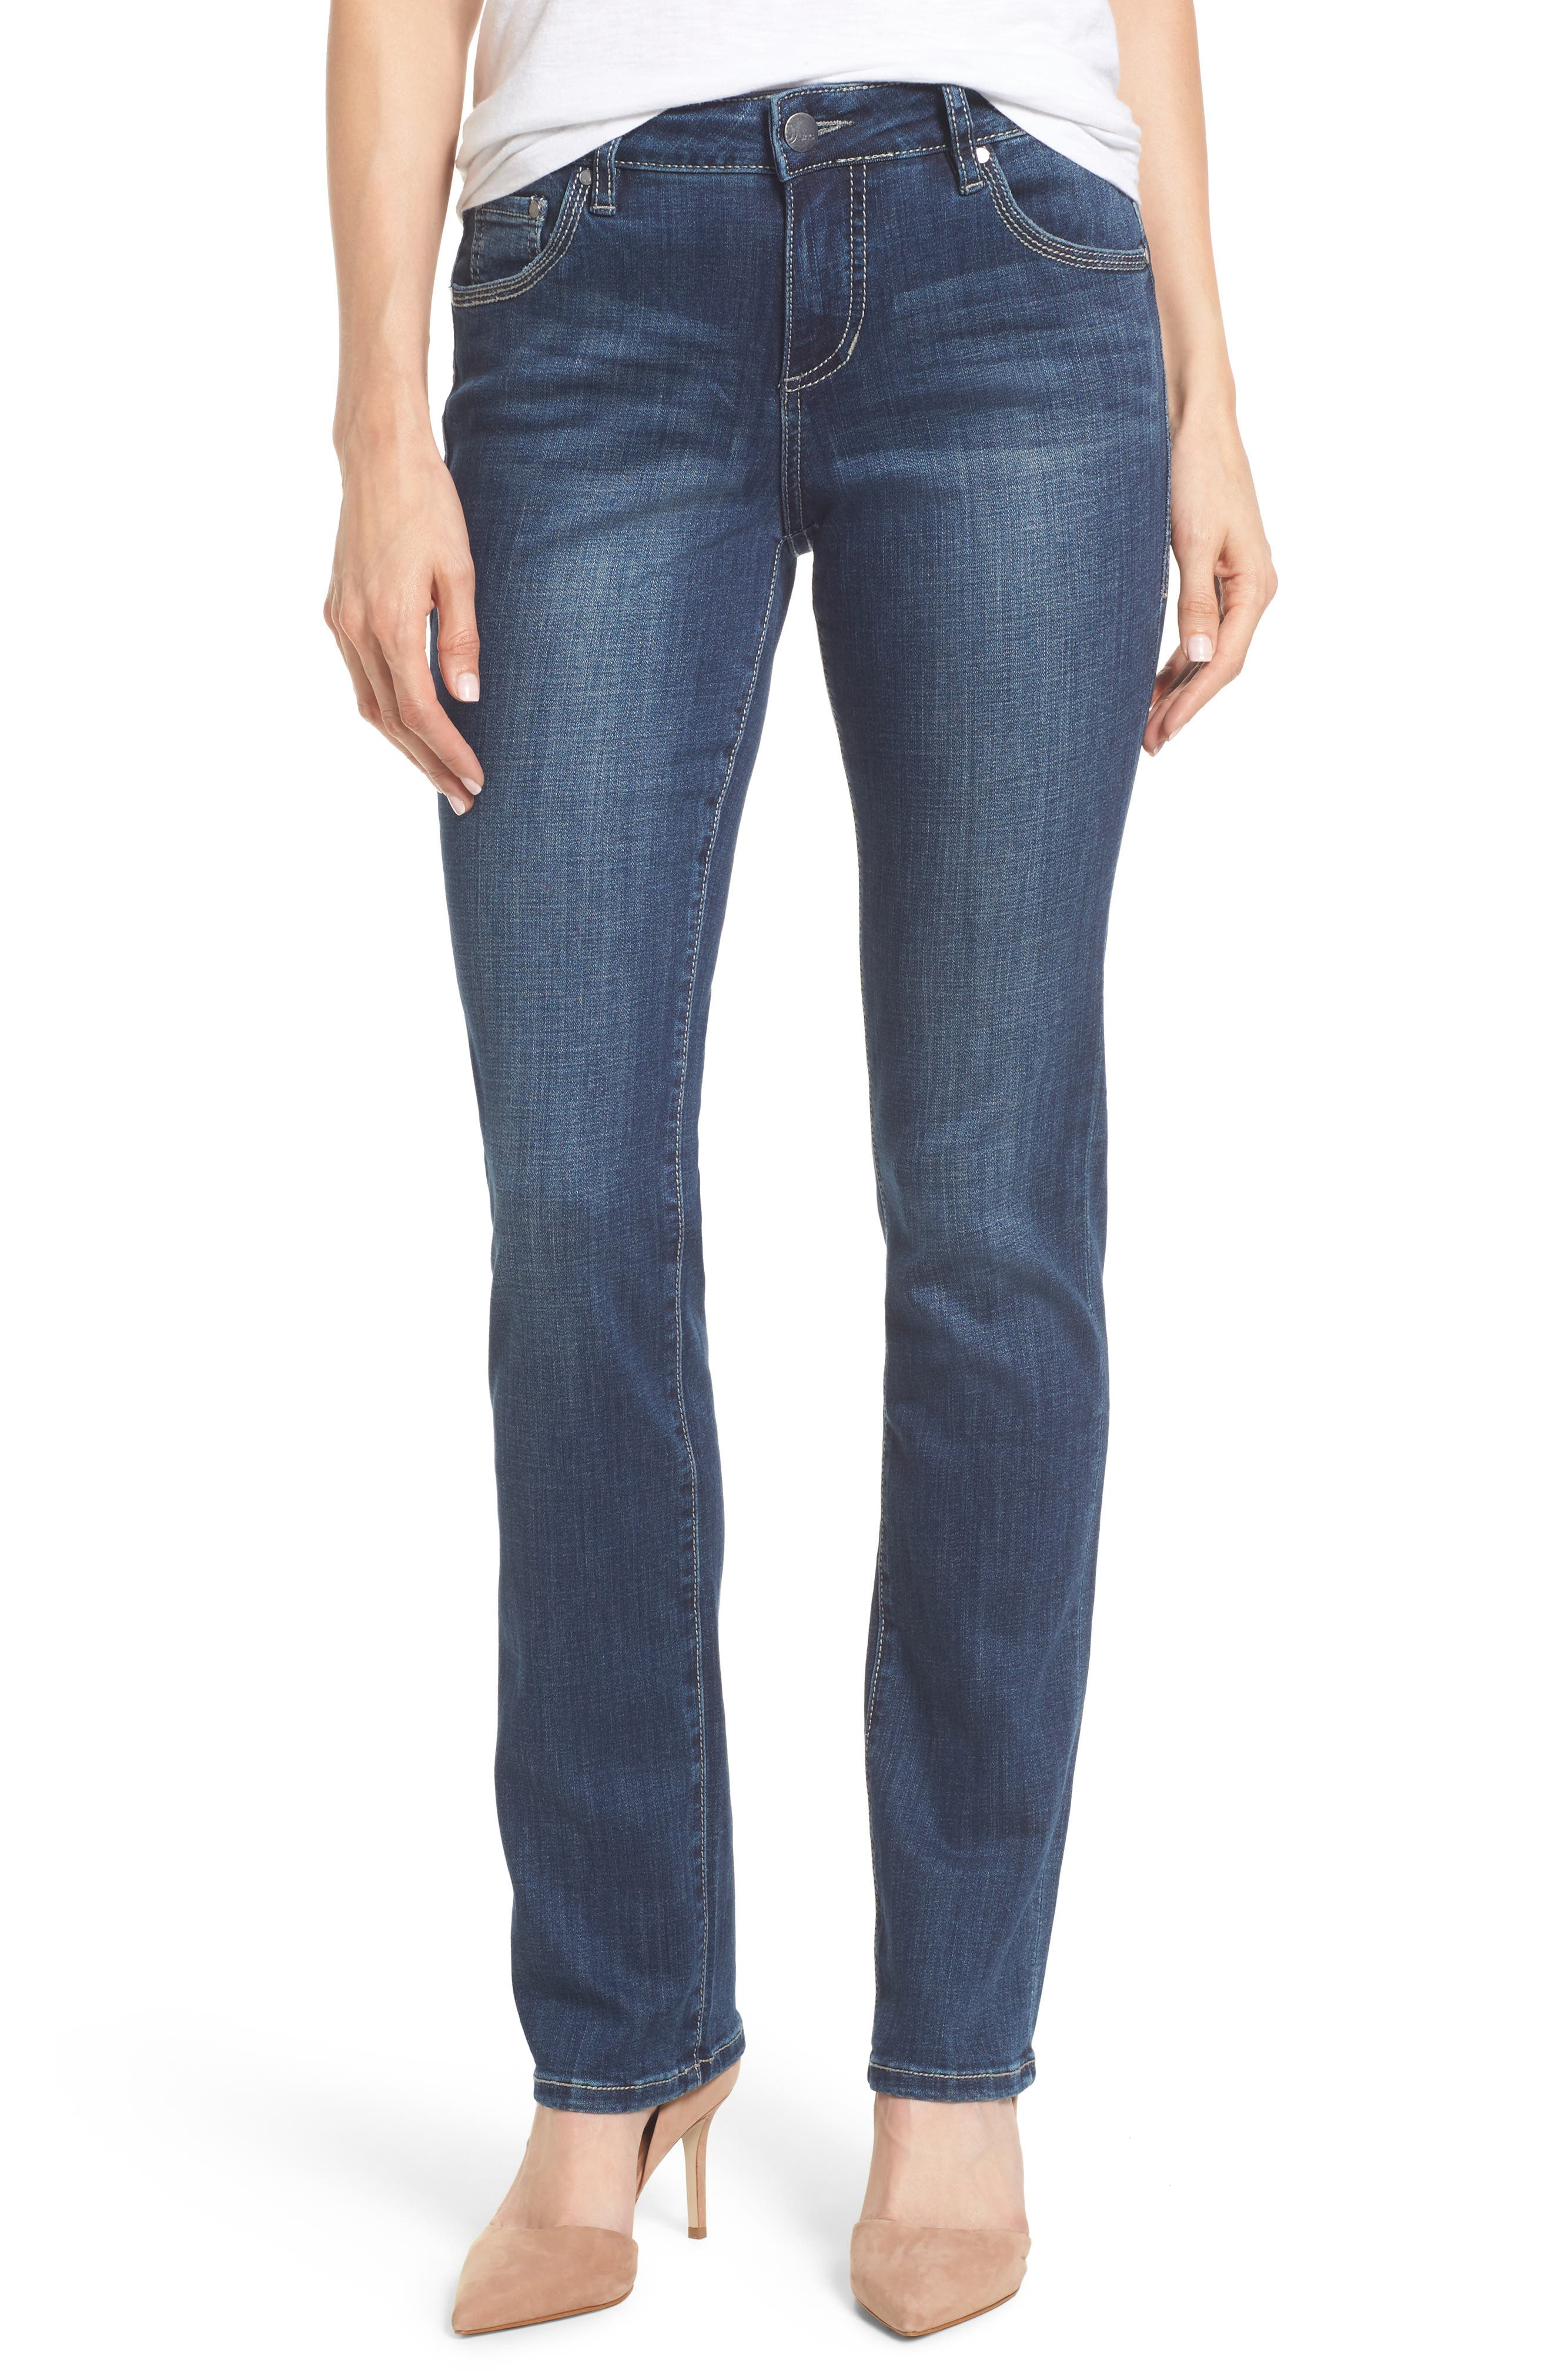 Adrian Straight Leg Jeans,                         Main,                         color, Thorne Blue